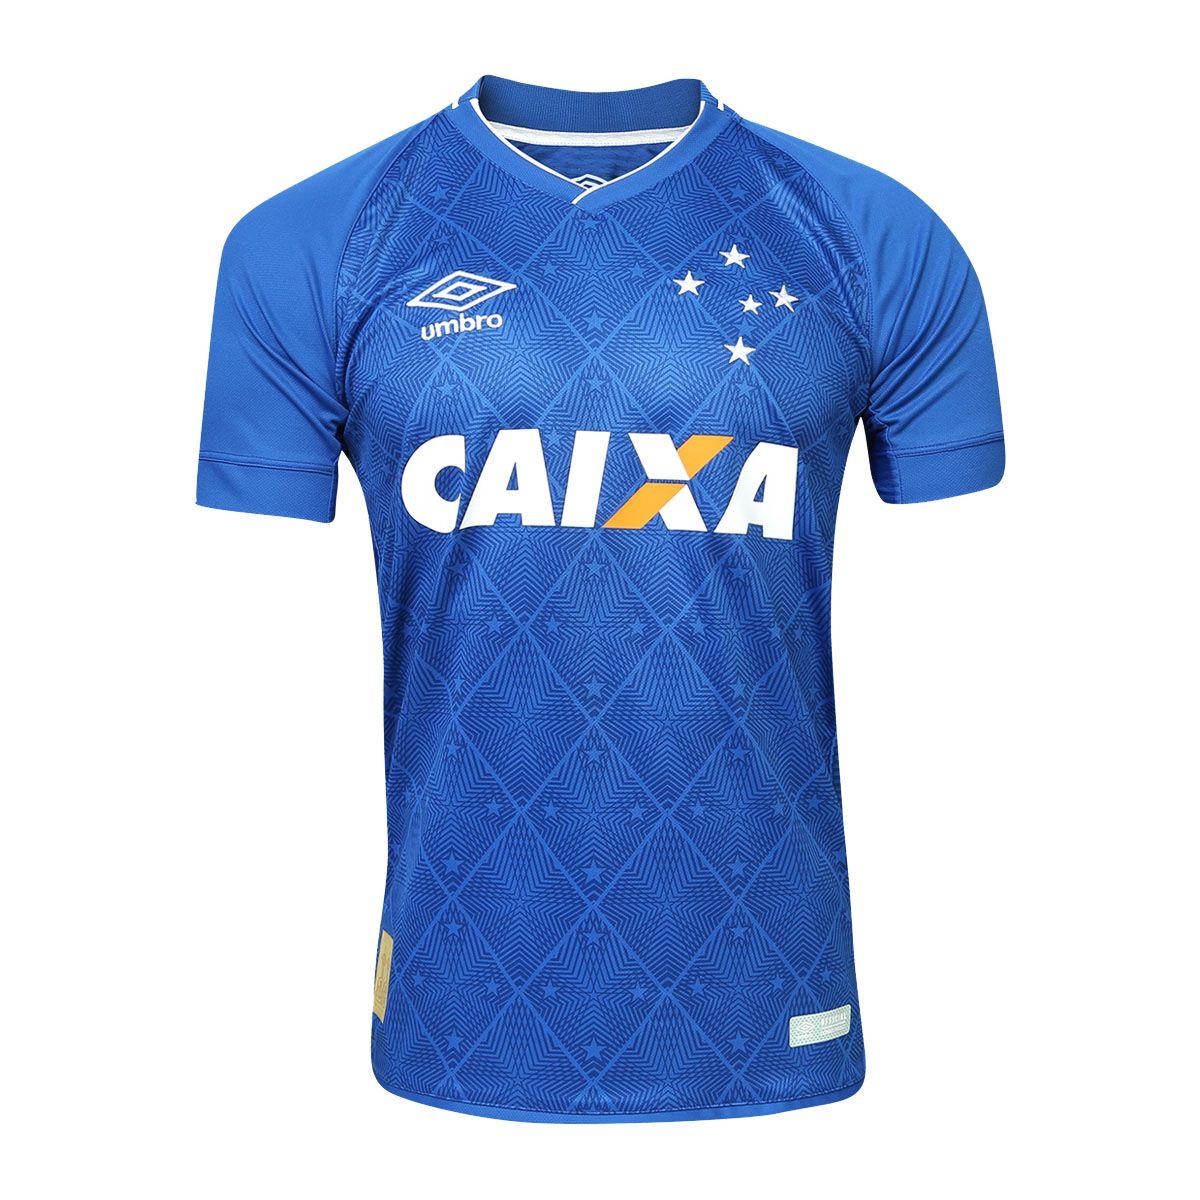 6343671304 Camisa Cruzeiro Umbro 2017 Azul Masculina - Sport Center Jaraguá ...